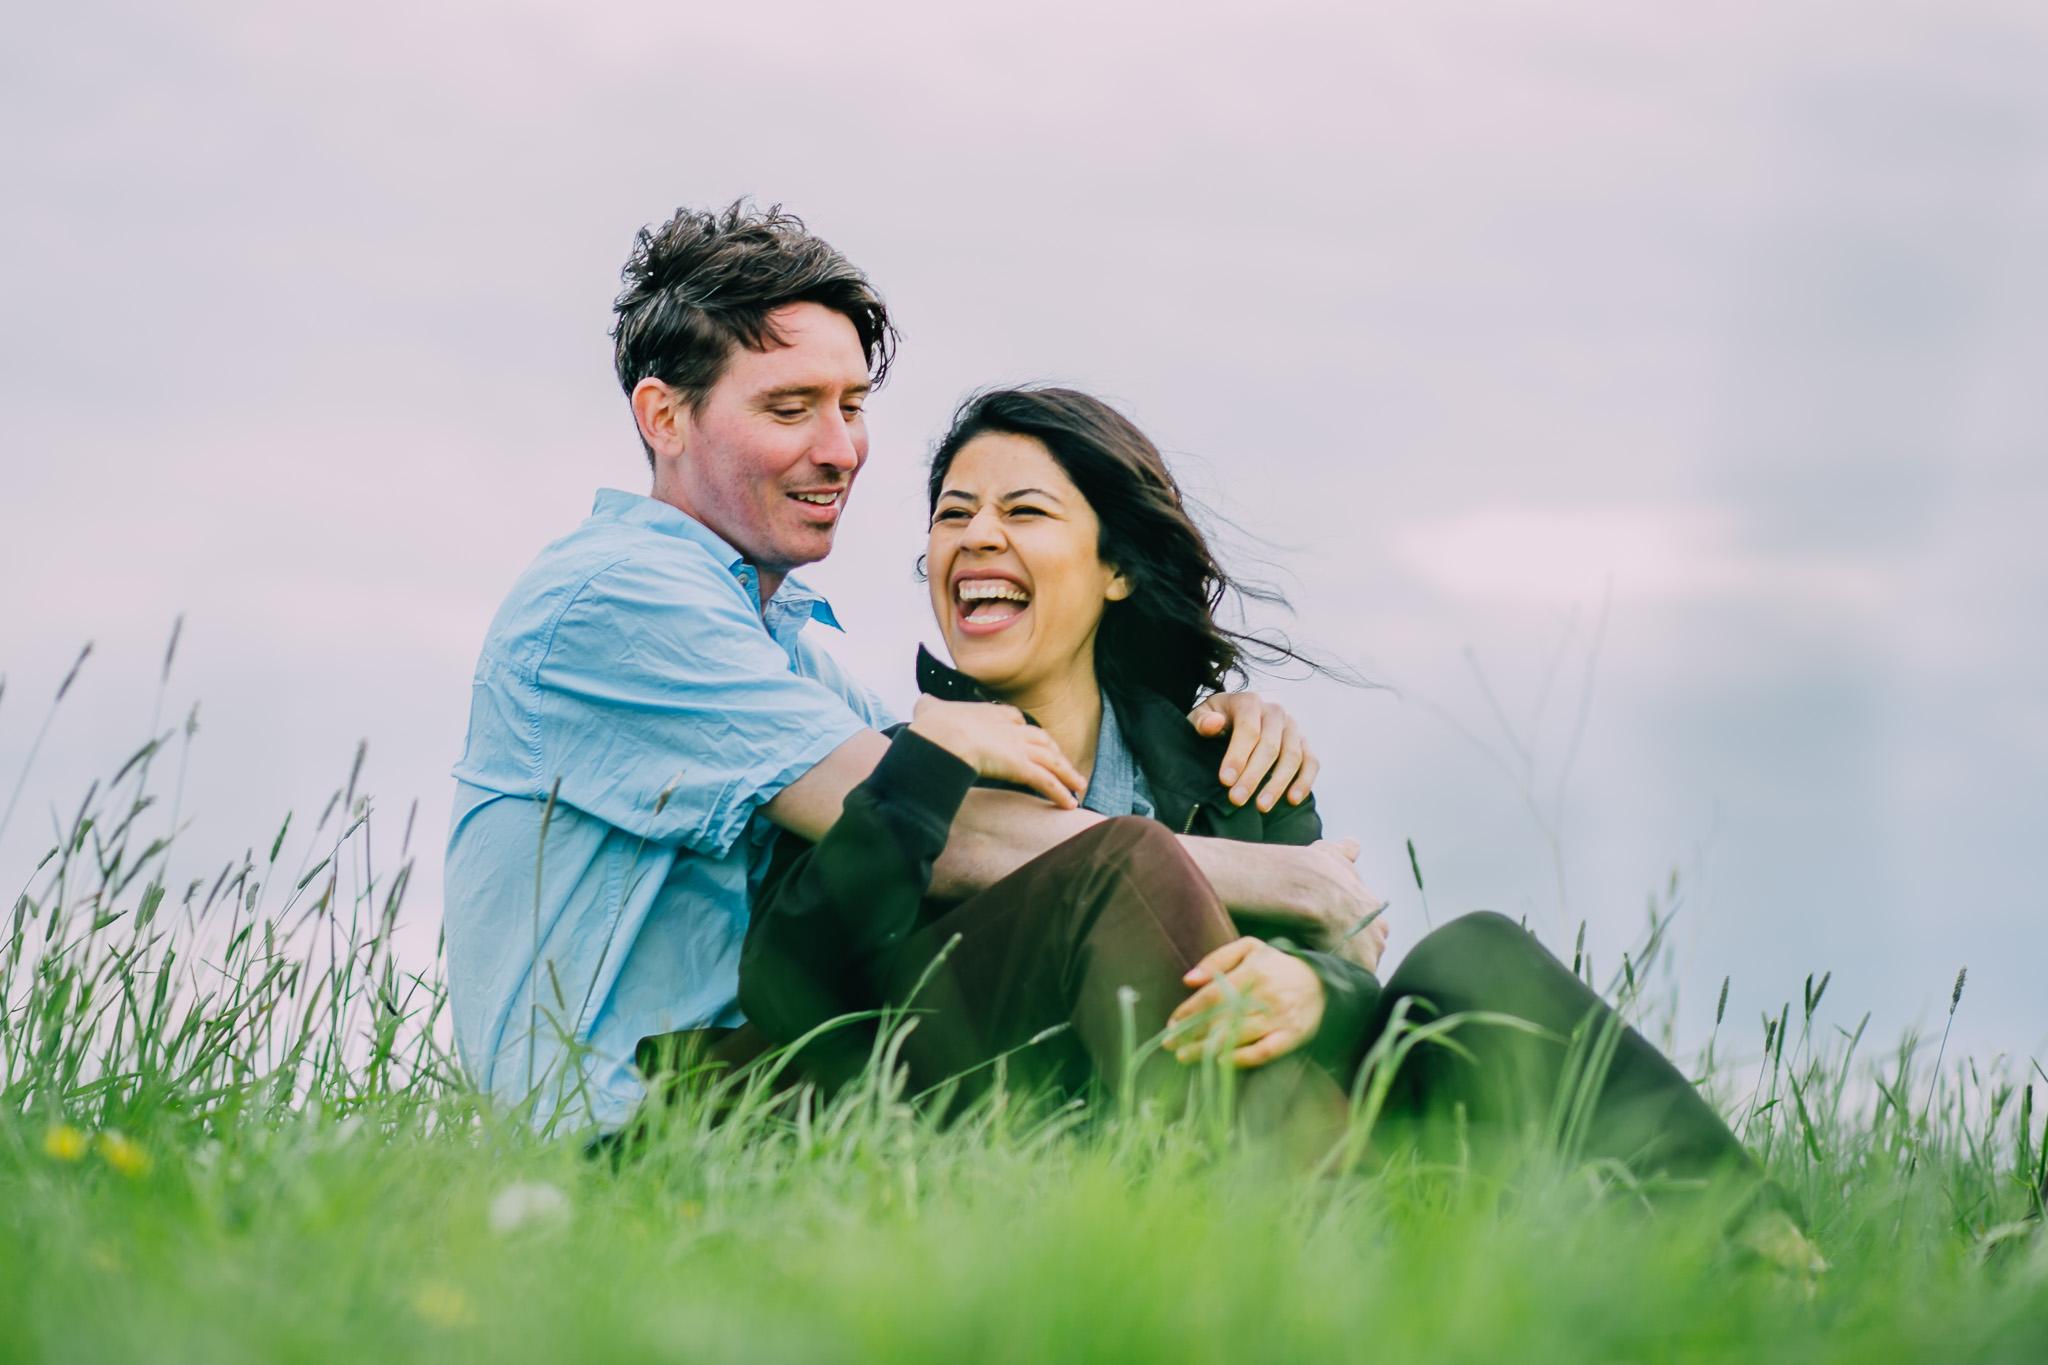 Torontoweddingphotographer-7.jpg